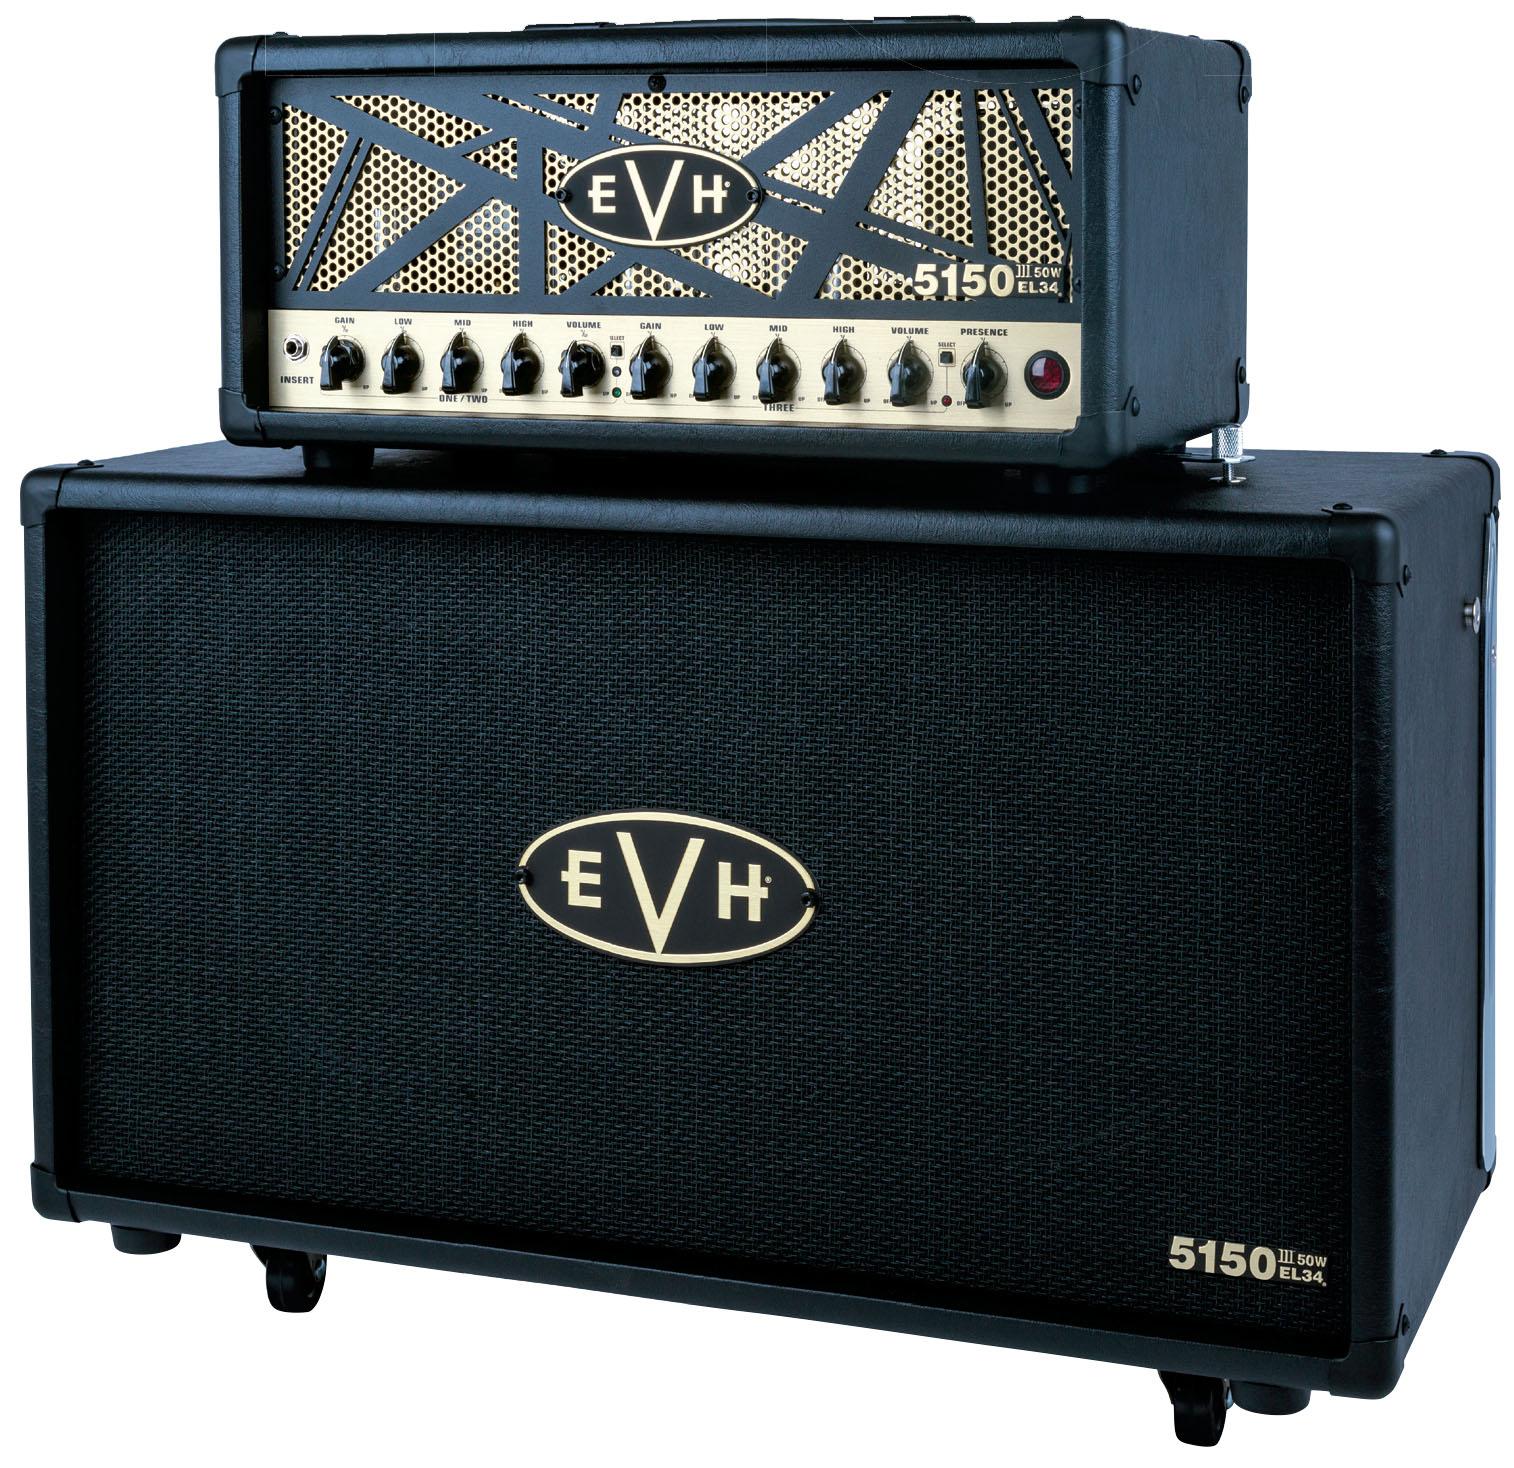 040755464fe Review  EVH 5150 III 50-Watt EL34 Head